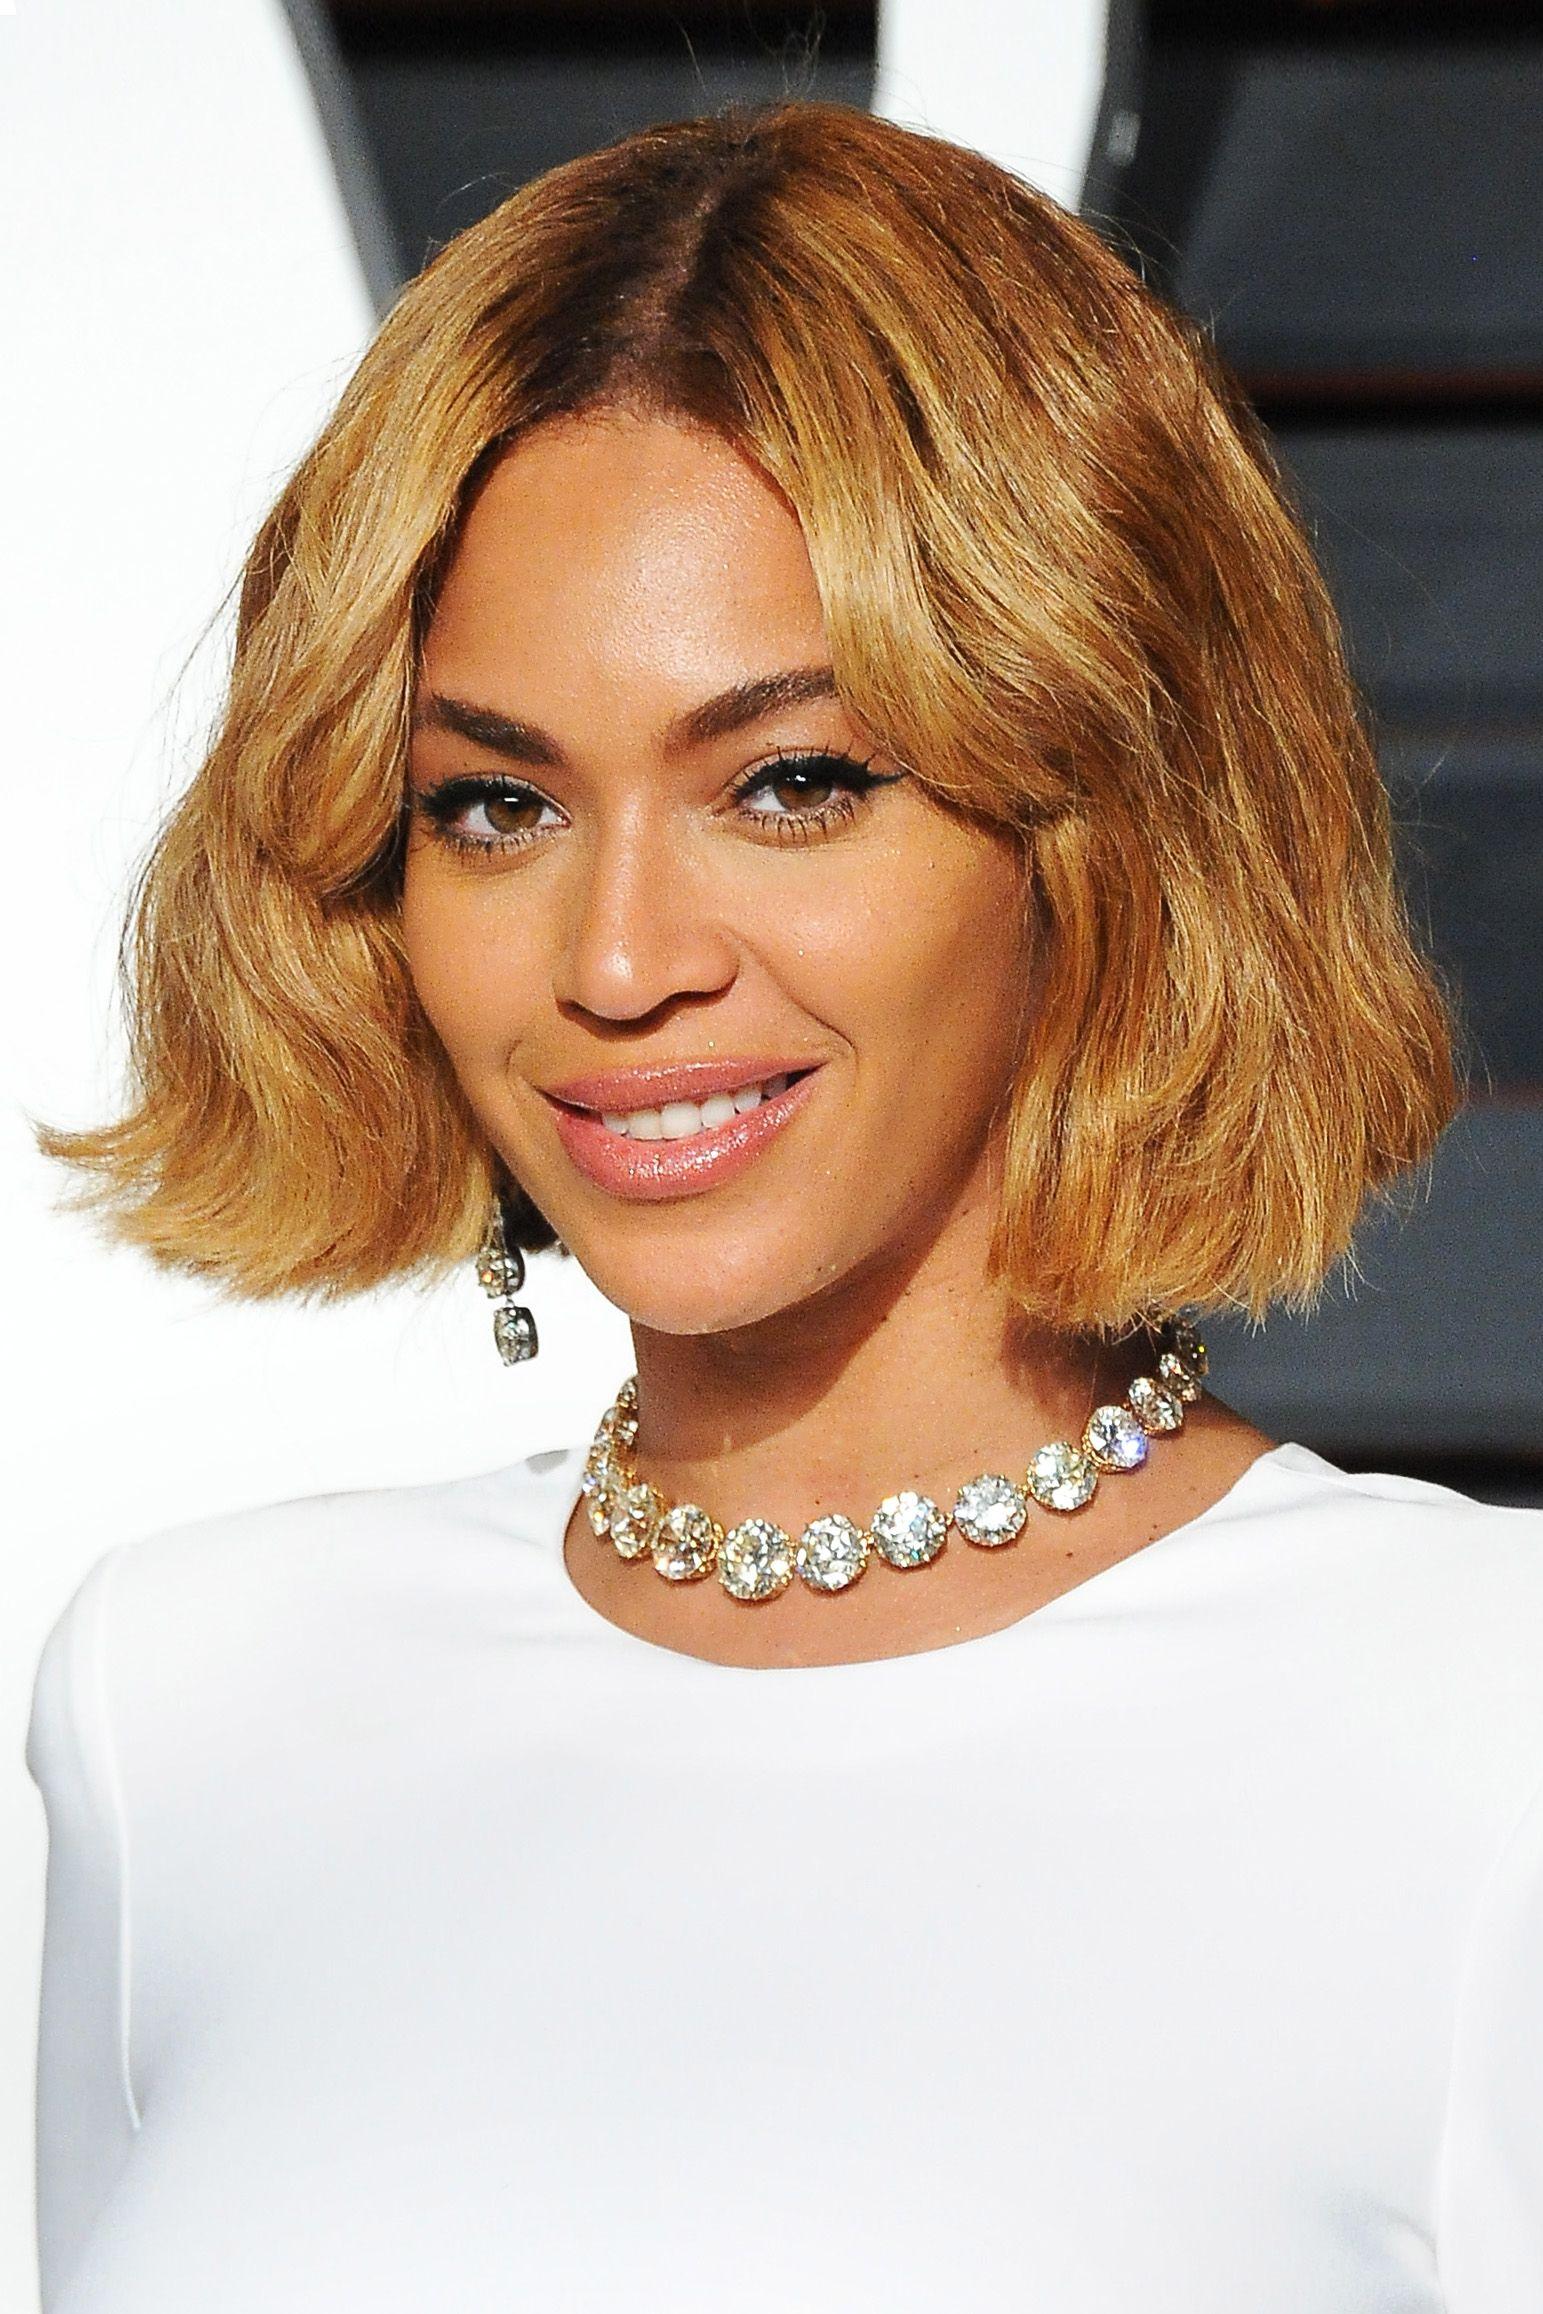 Beyonce Haircut : beyonce, haircut, Beyonce, Hairstyles, Beyoncé's, Evolving, Looks